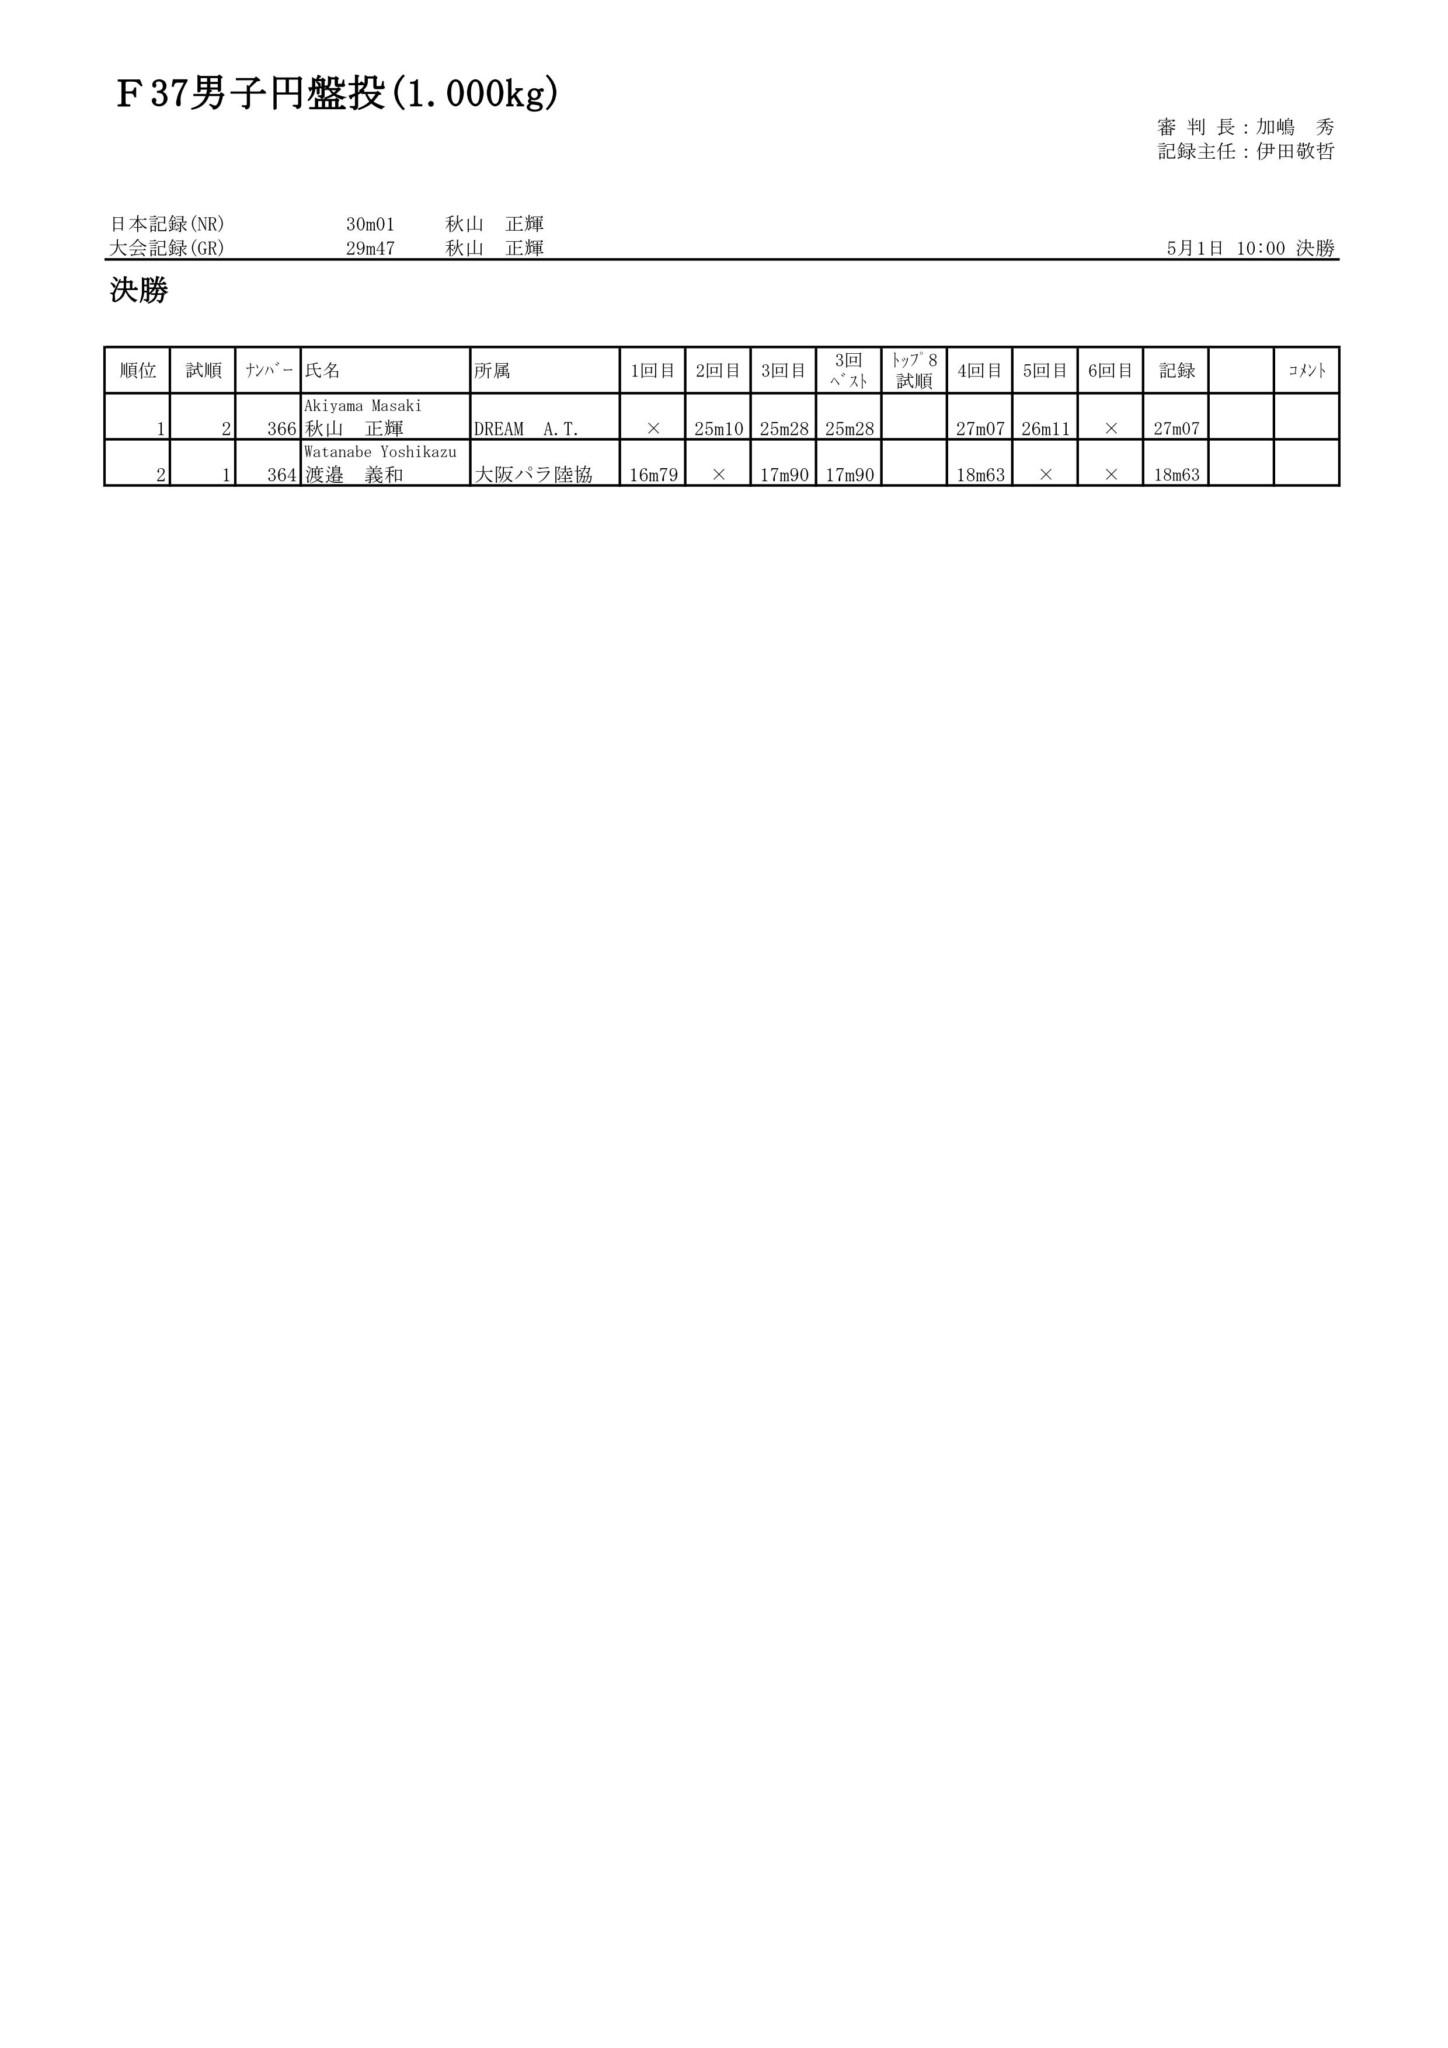 10F37男子円盤投(1.000kg)_01